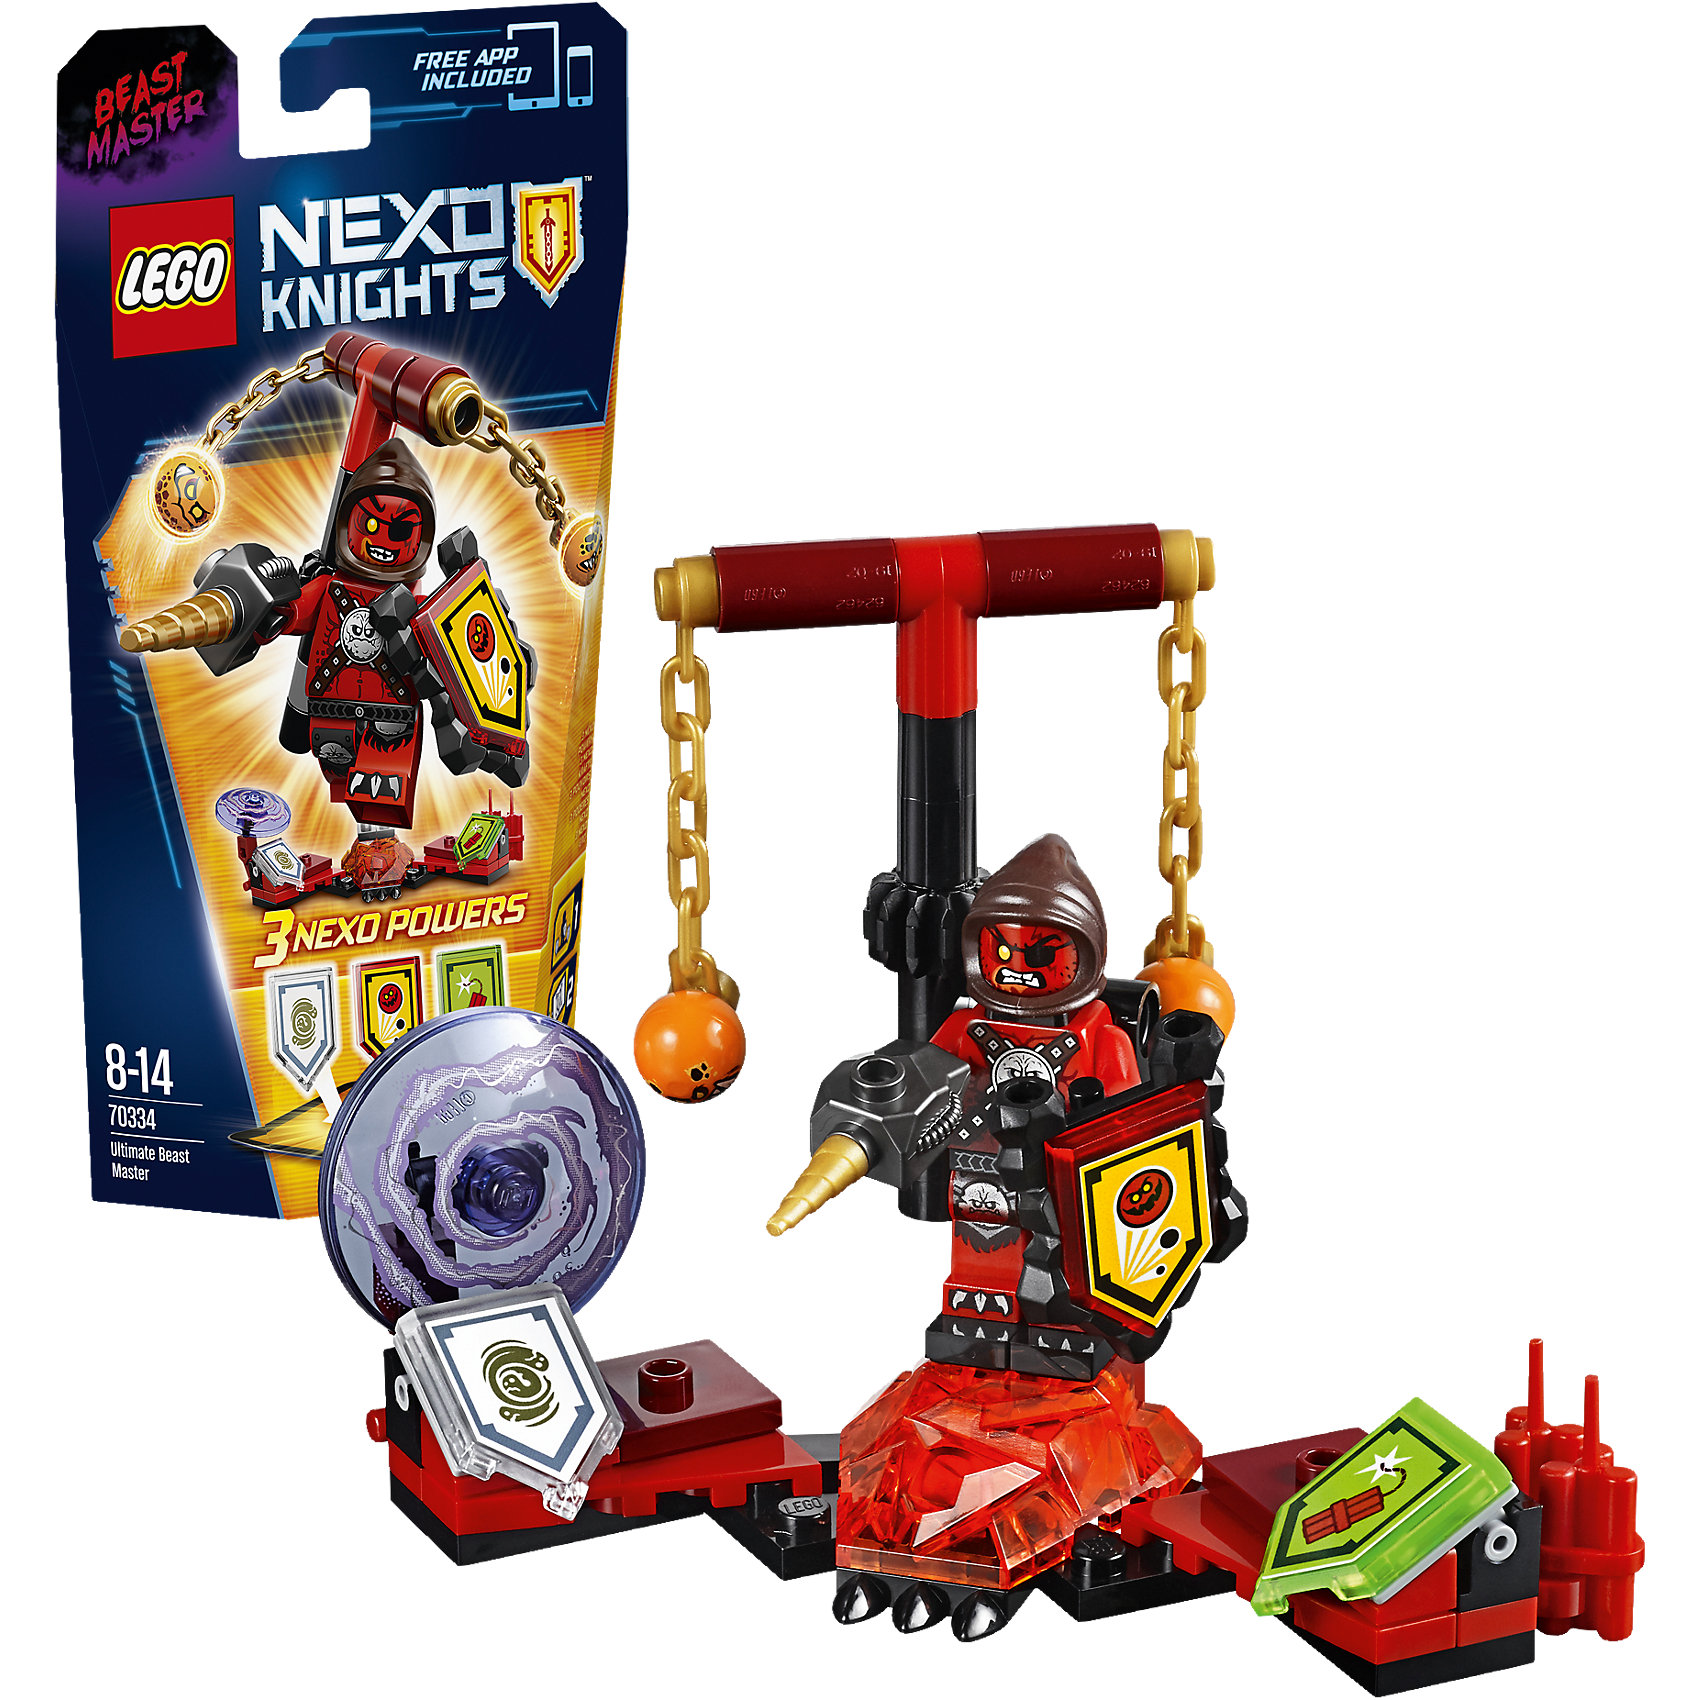 LEGO LEGO NEXO KNIGHTS 70334: Предводитель монстров – Абсолютная сила lego lego nexo knights 70334 предводитель монстров – абсолютная сила